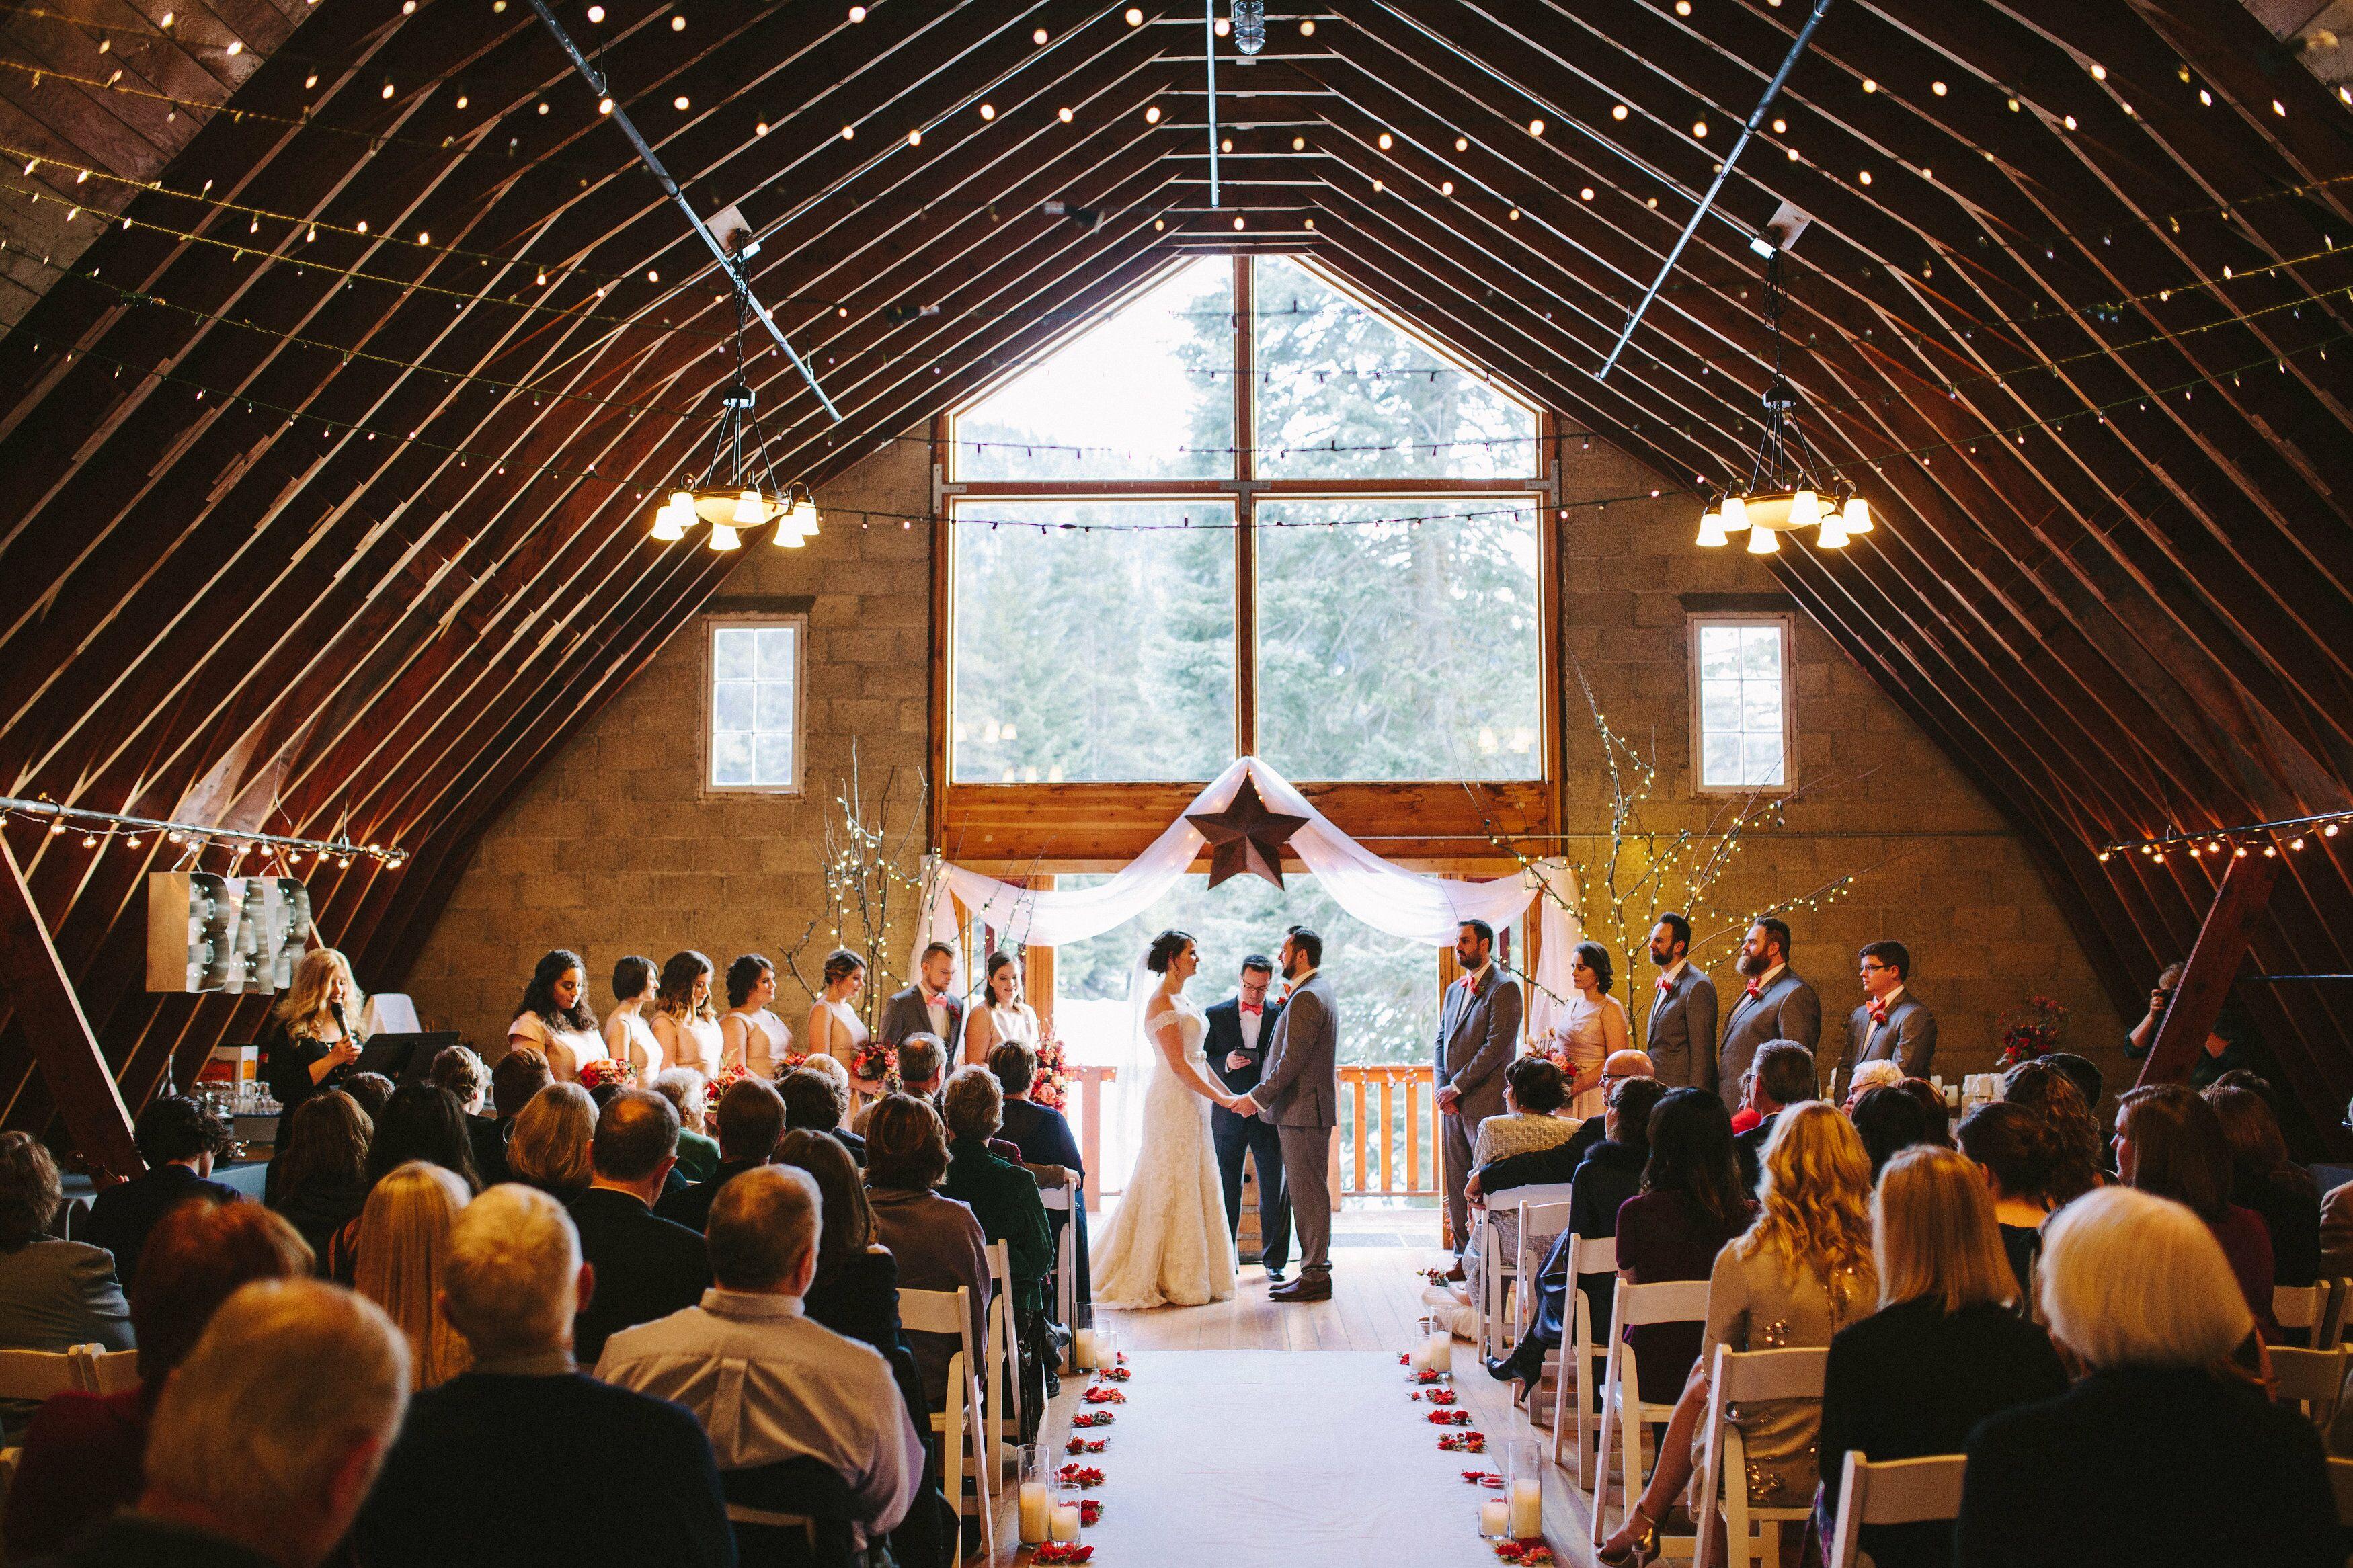 Pine river ranch b b and wedding destination leavenworth wa for Leavenworth wa wedding venues